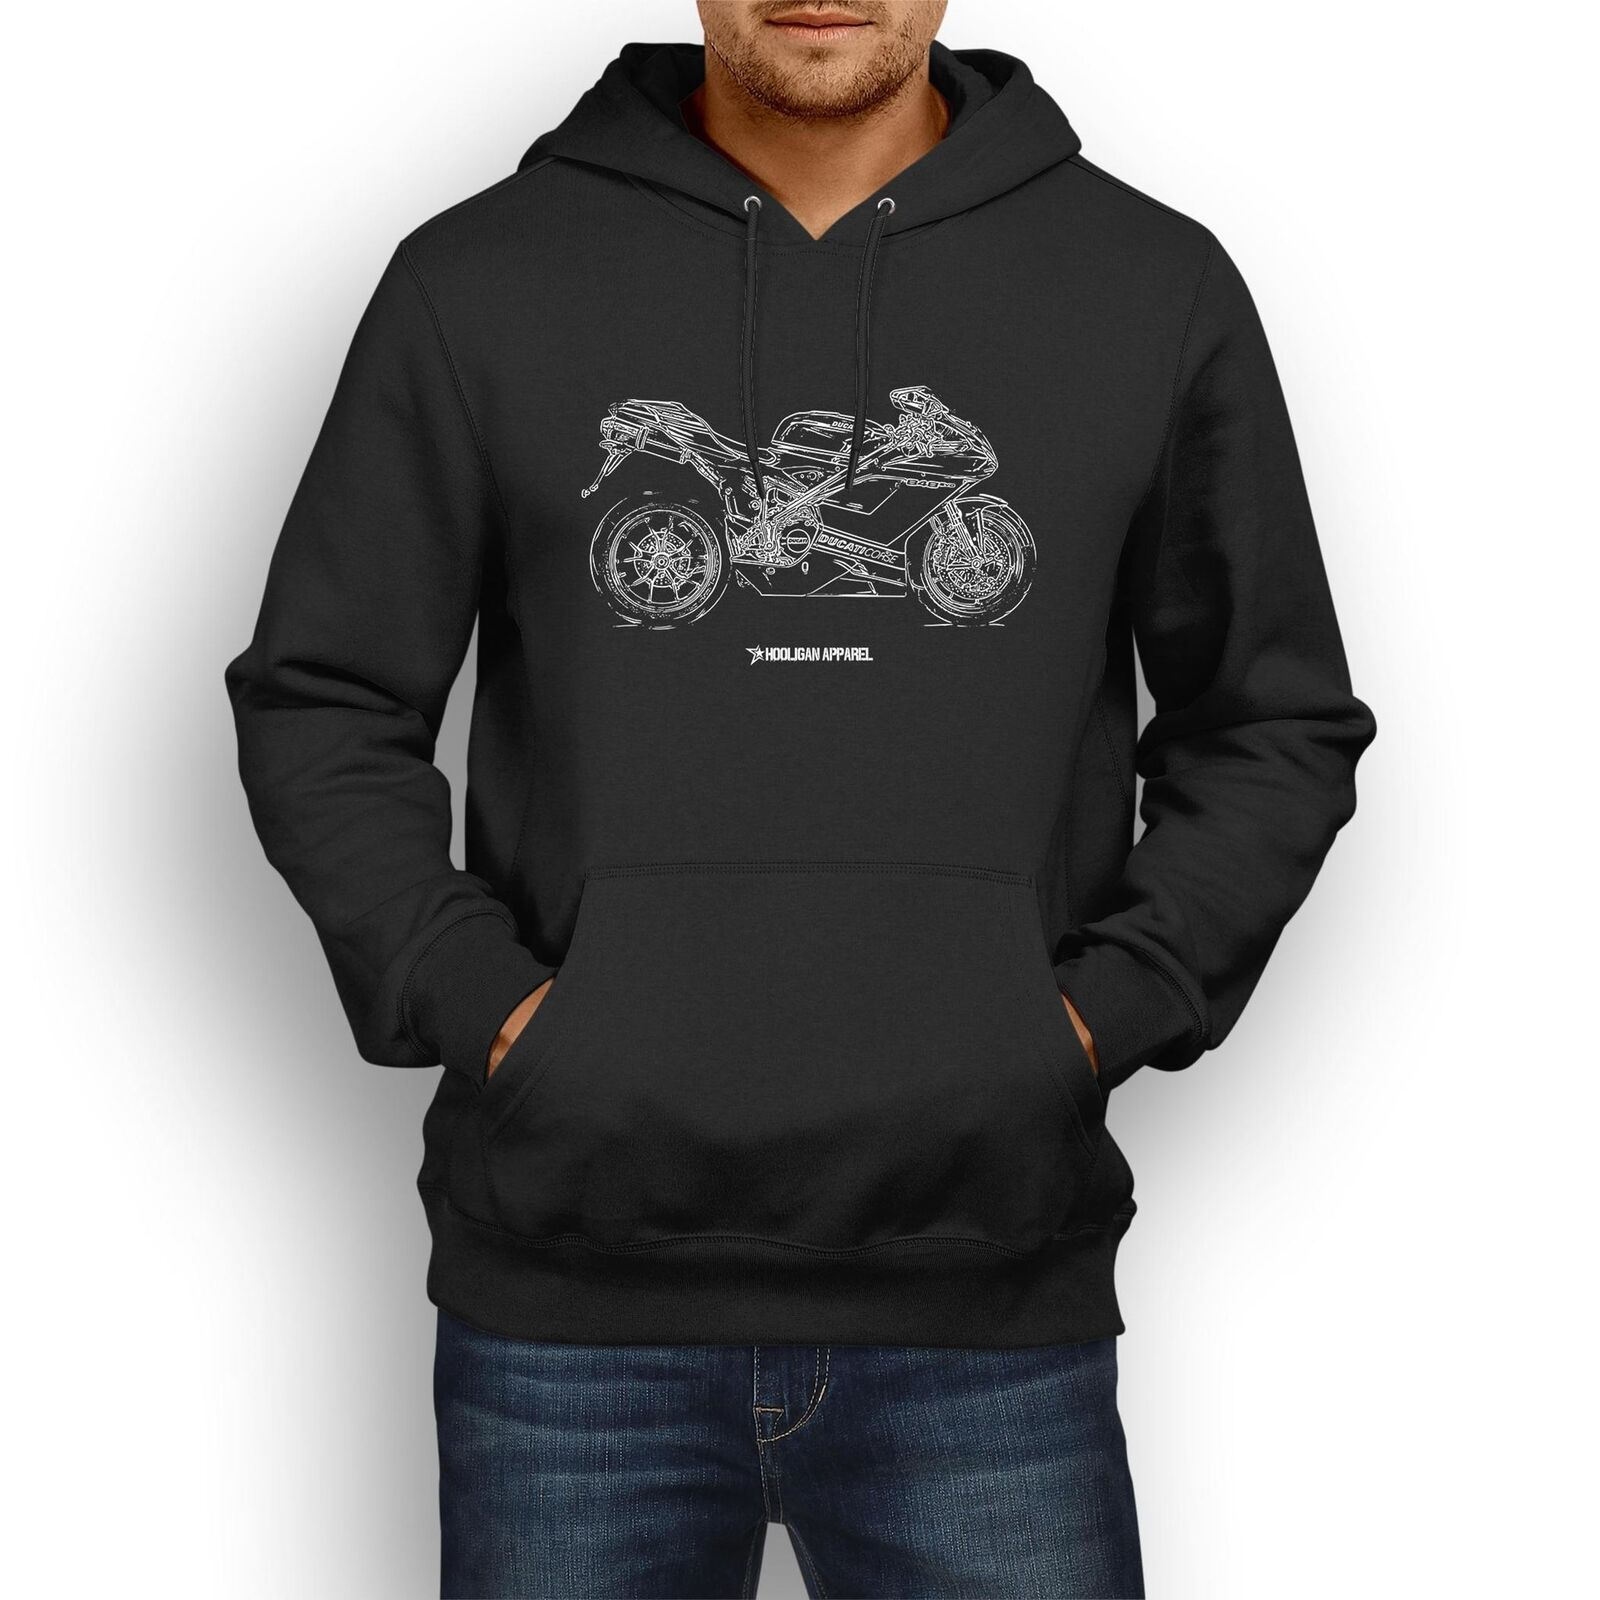 Ducati 848 EVO Corse SE 2013 InspiROT Motorcycle Art Men's Hoodie